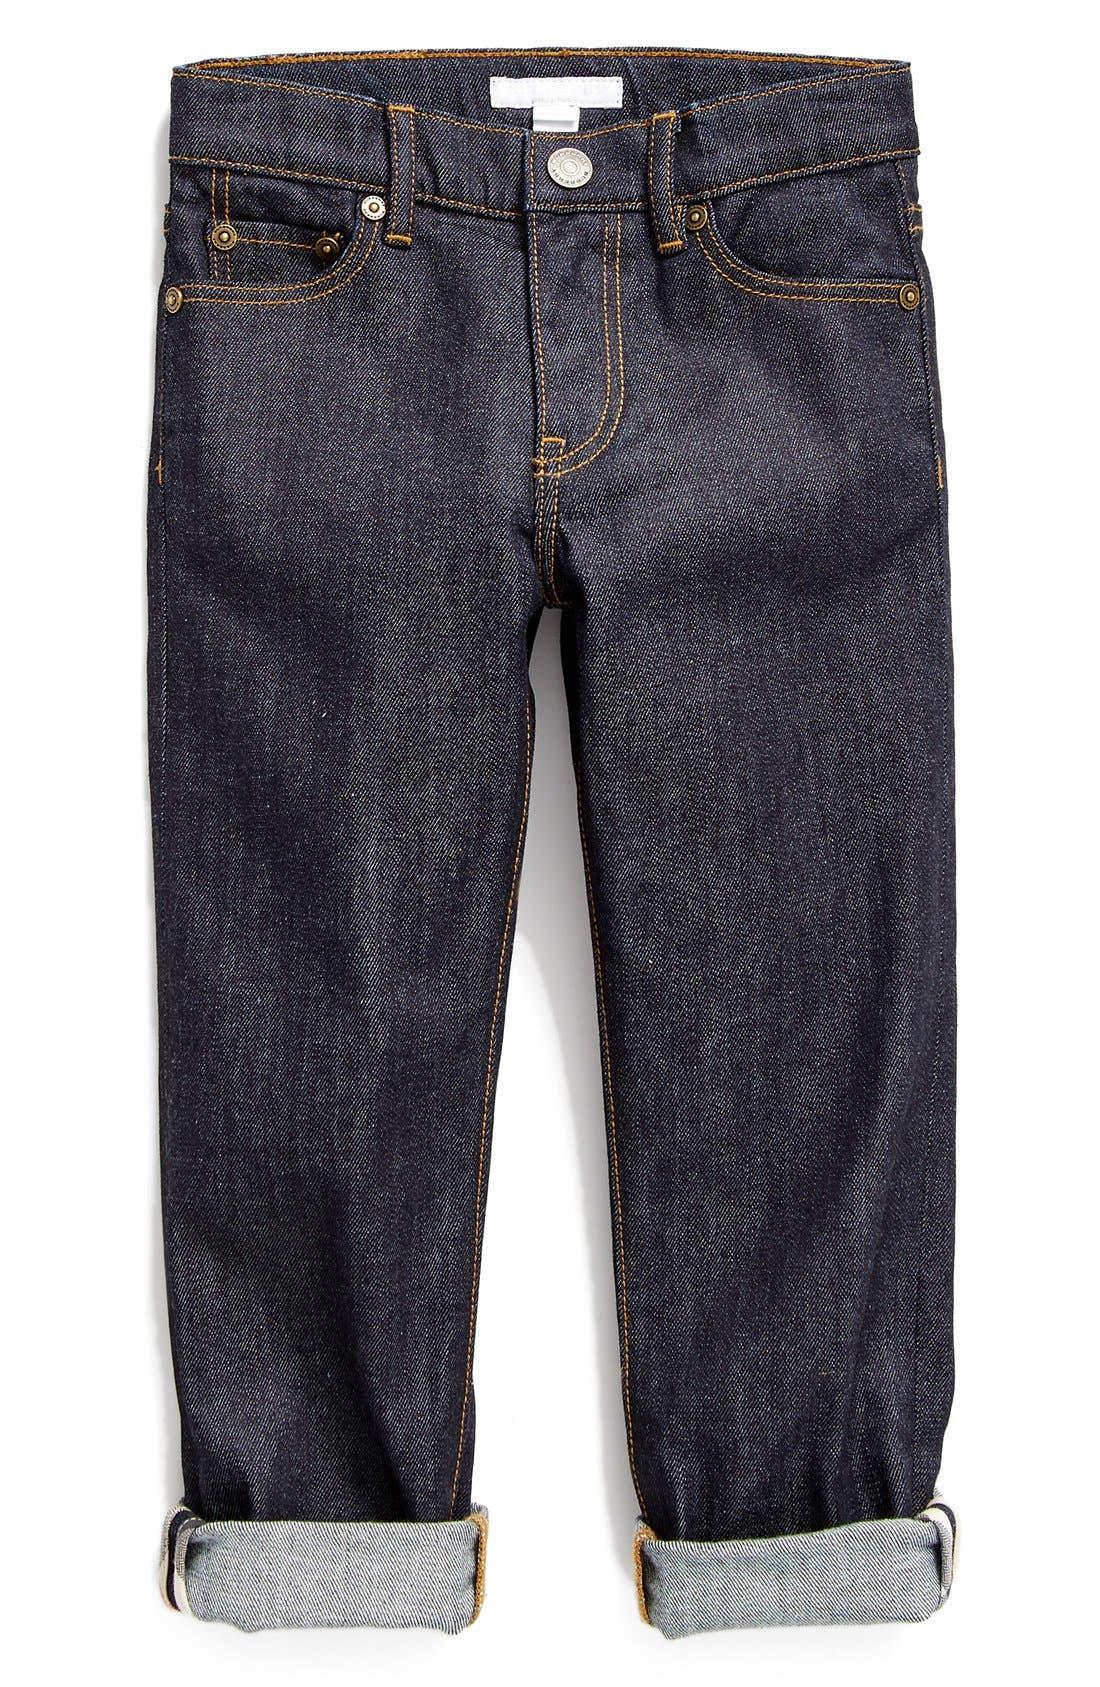 Alternate Image 1 Selected - Burberry Skinny Fit Jeans (Little Boys & Big Boys)